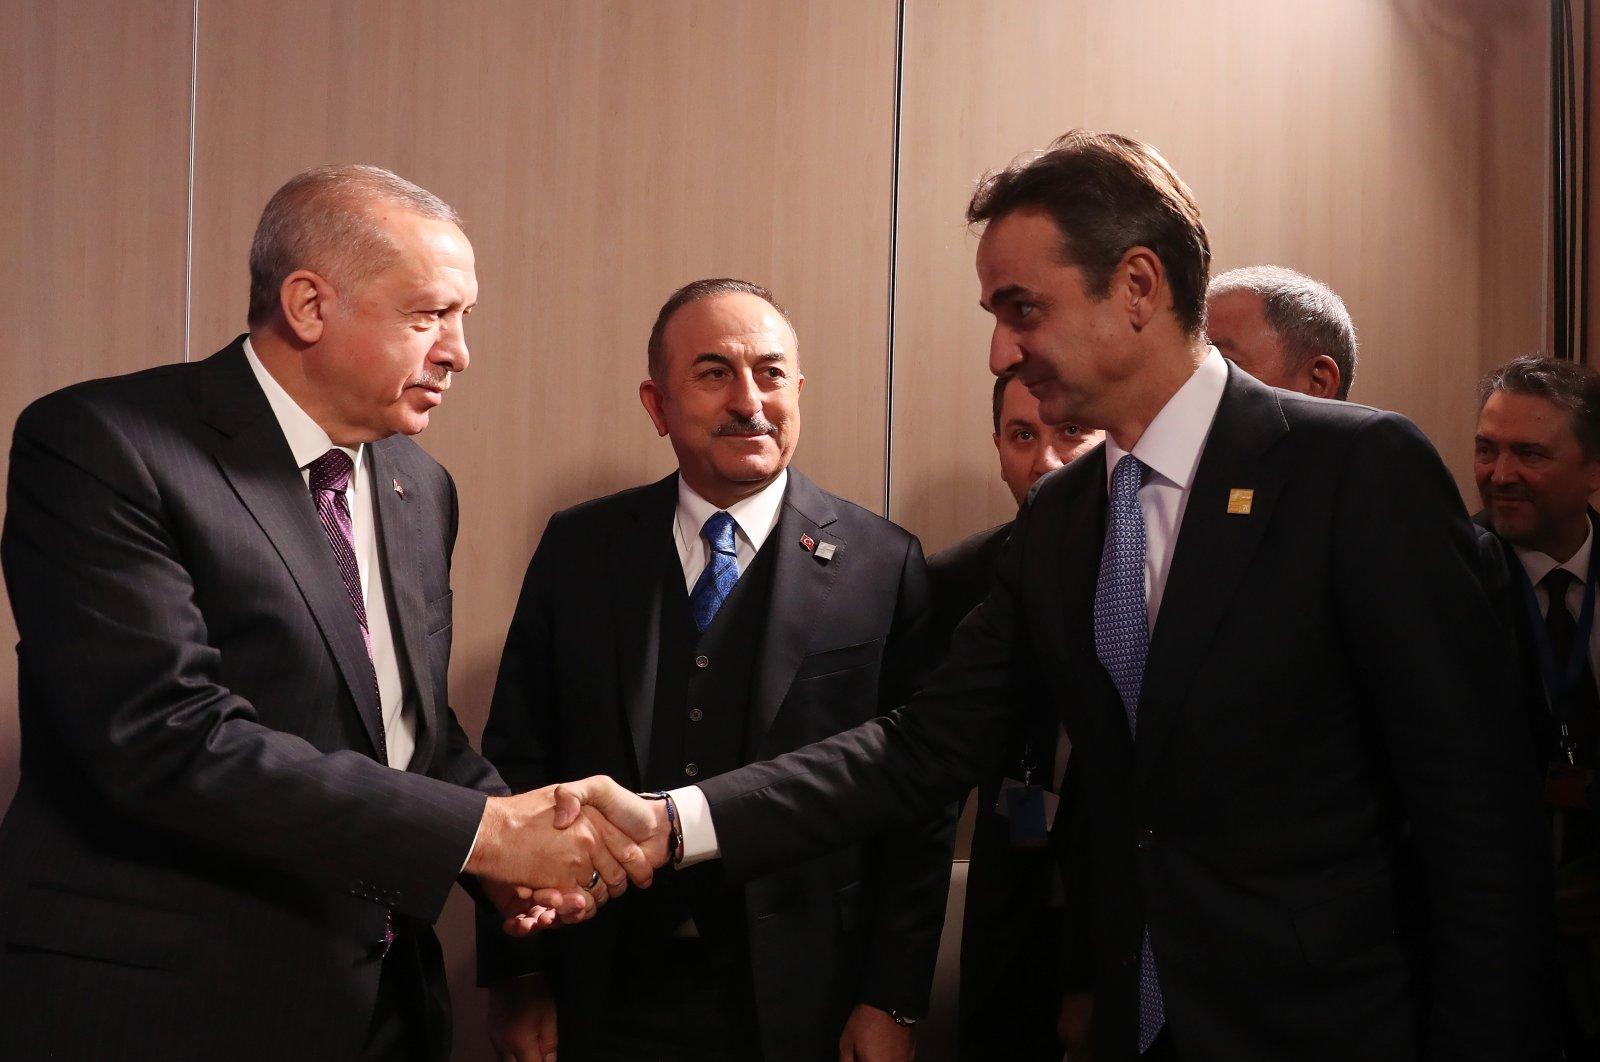 President Recep Tayyip Erdoğan (L) shake hands with Greek Prime Minister Kyriakos Mitsotakis during an event in Watford, Britain, Dec. 4, 2019. (AA Photo)